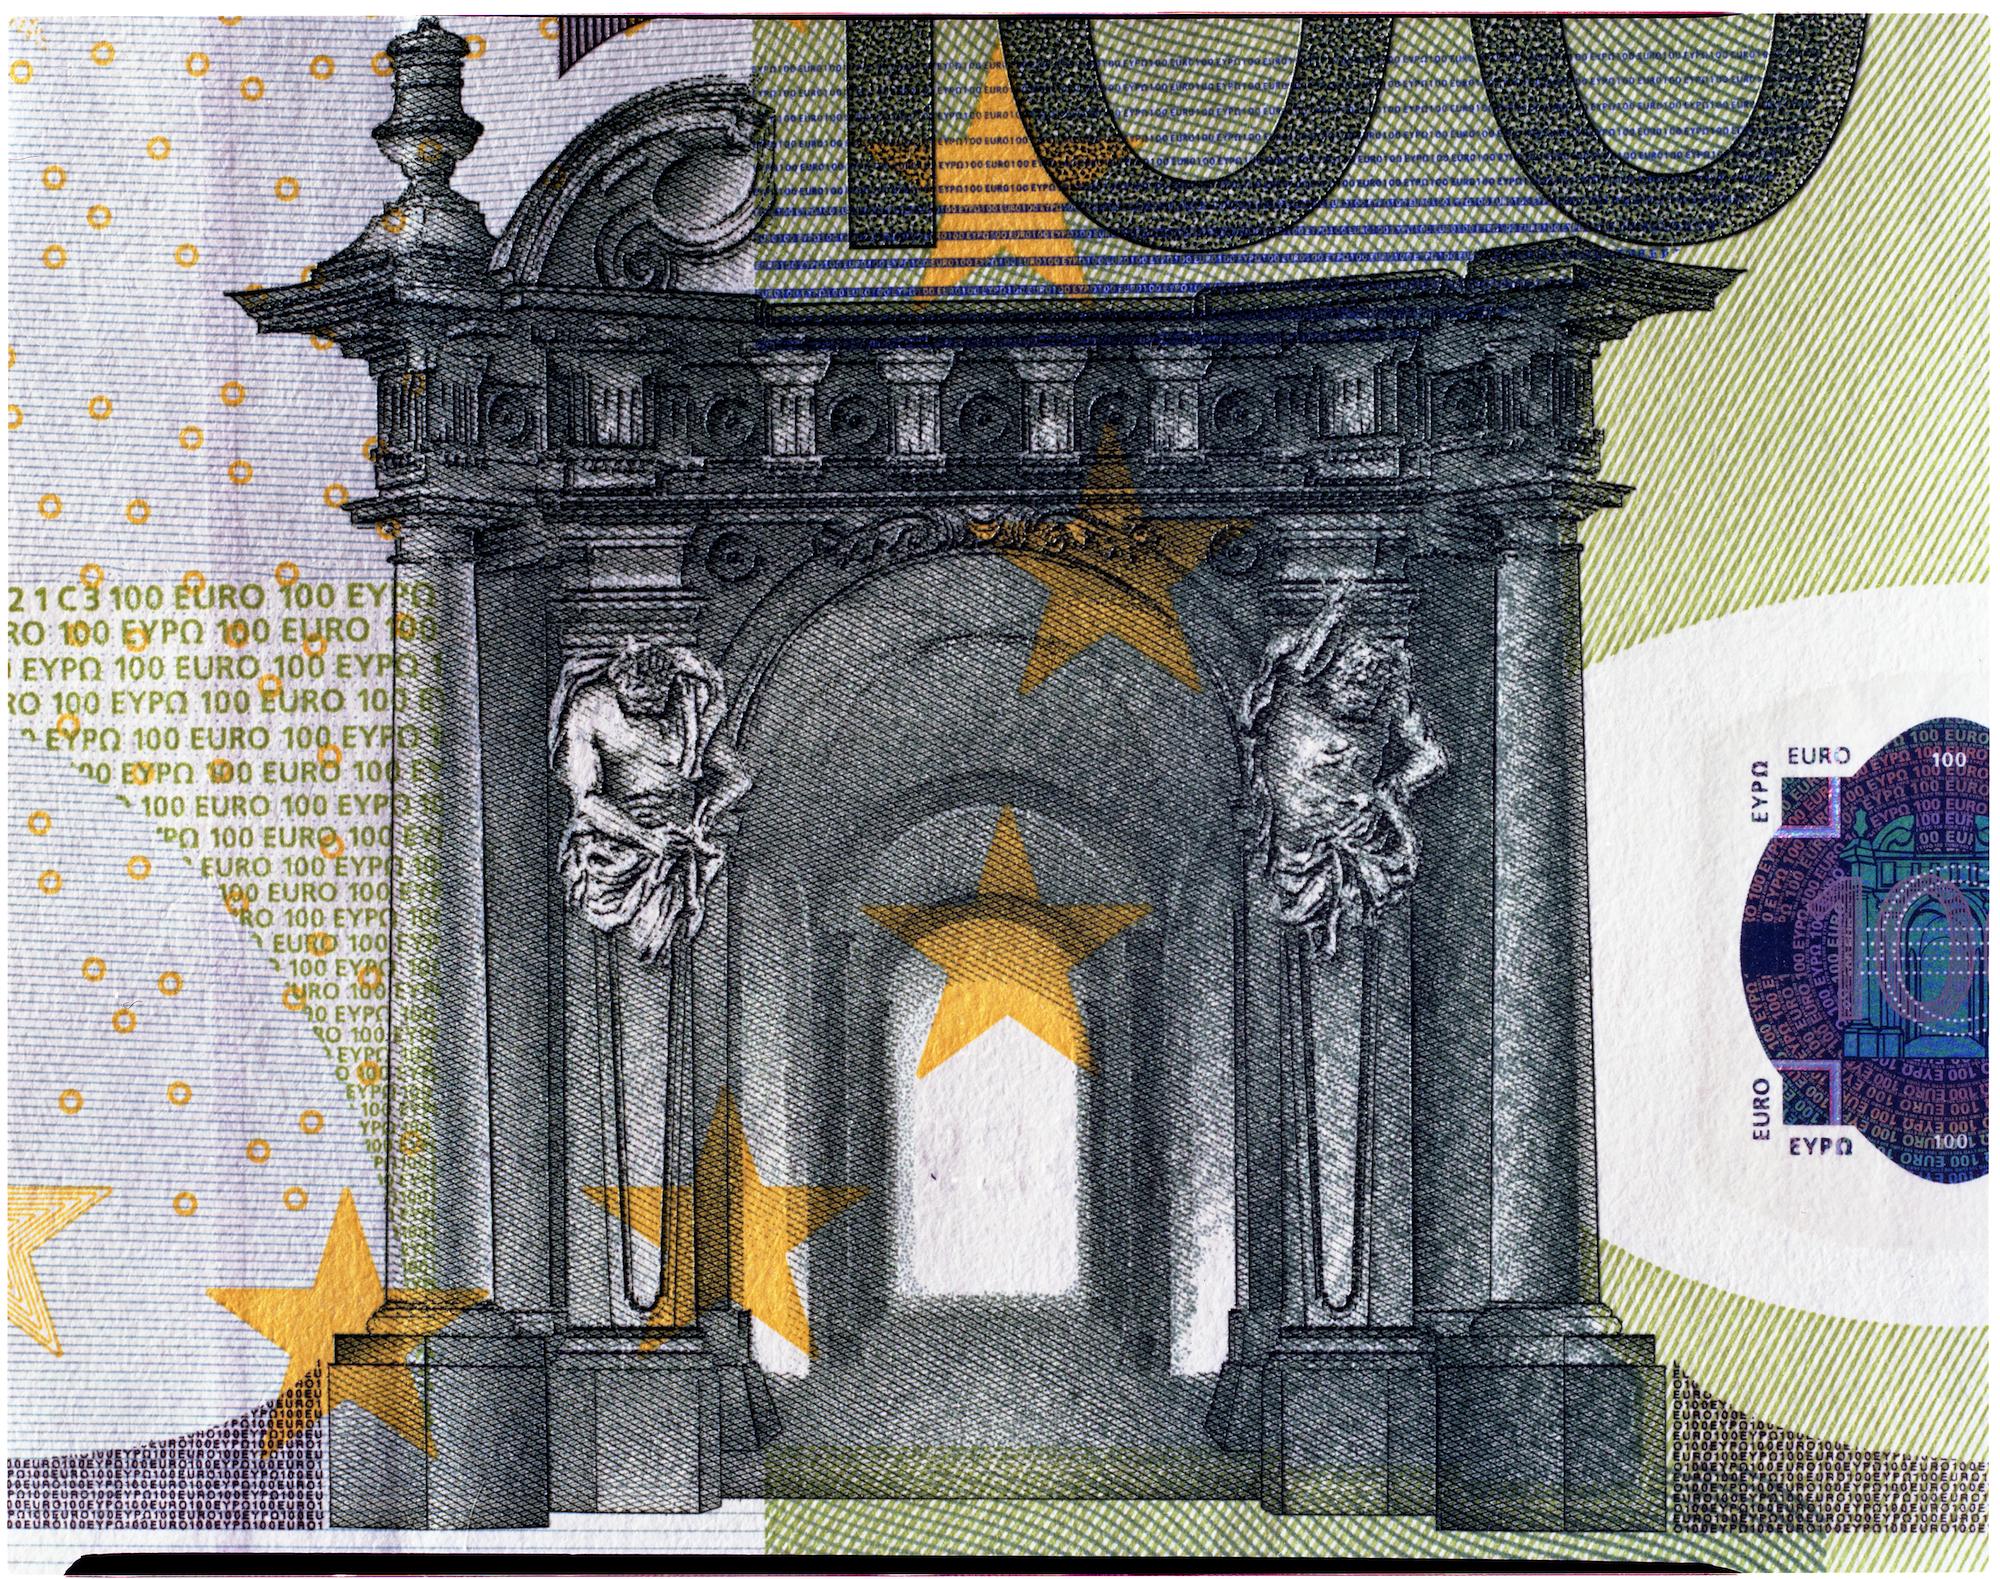 100 Euros - The Guardians